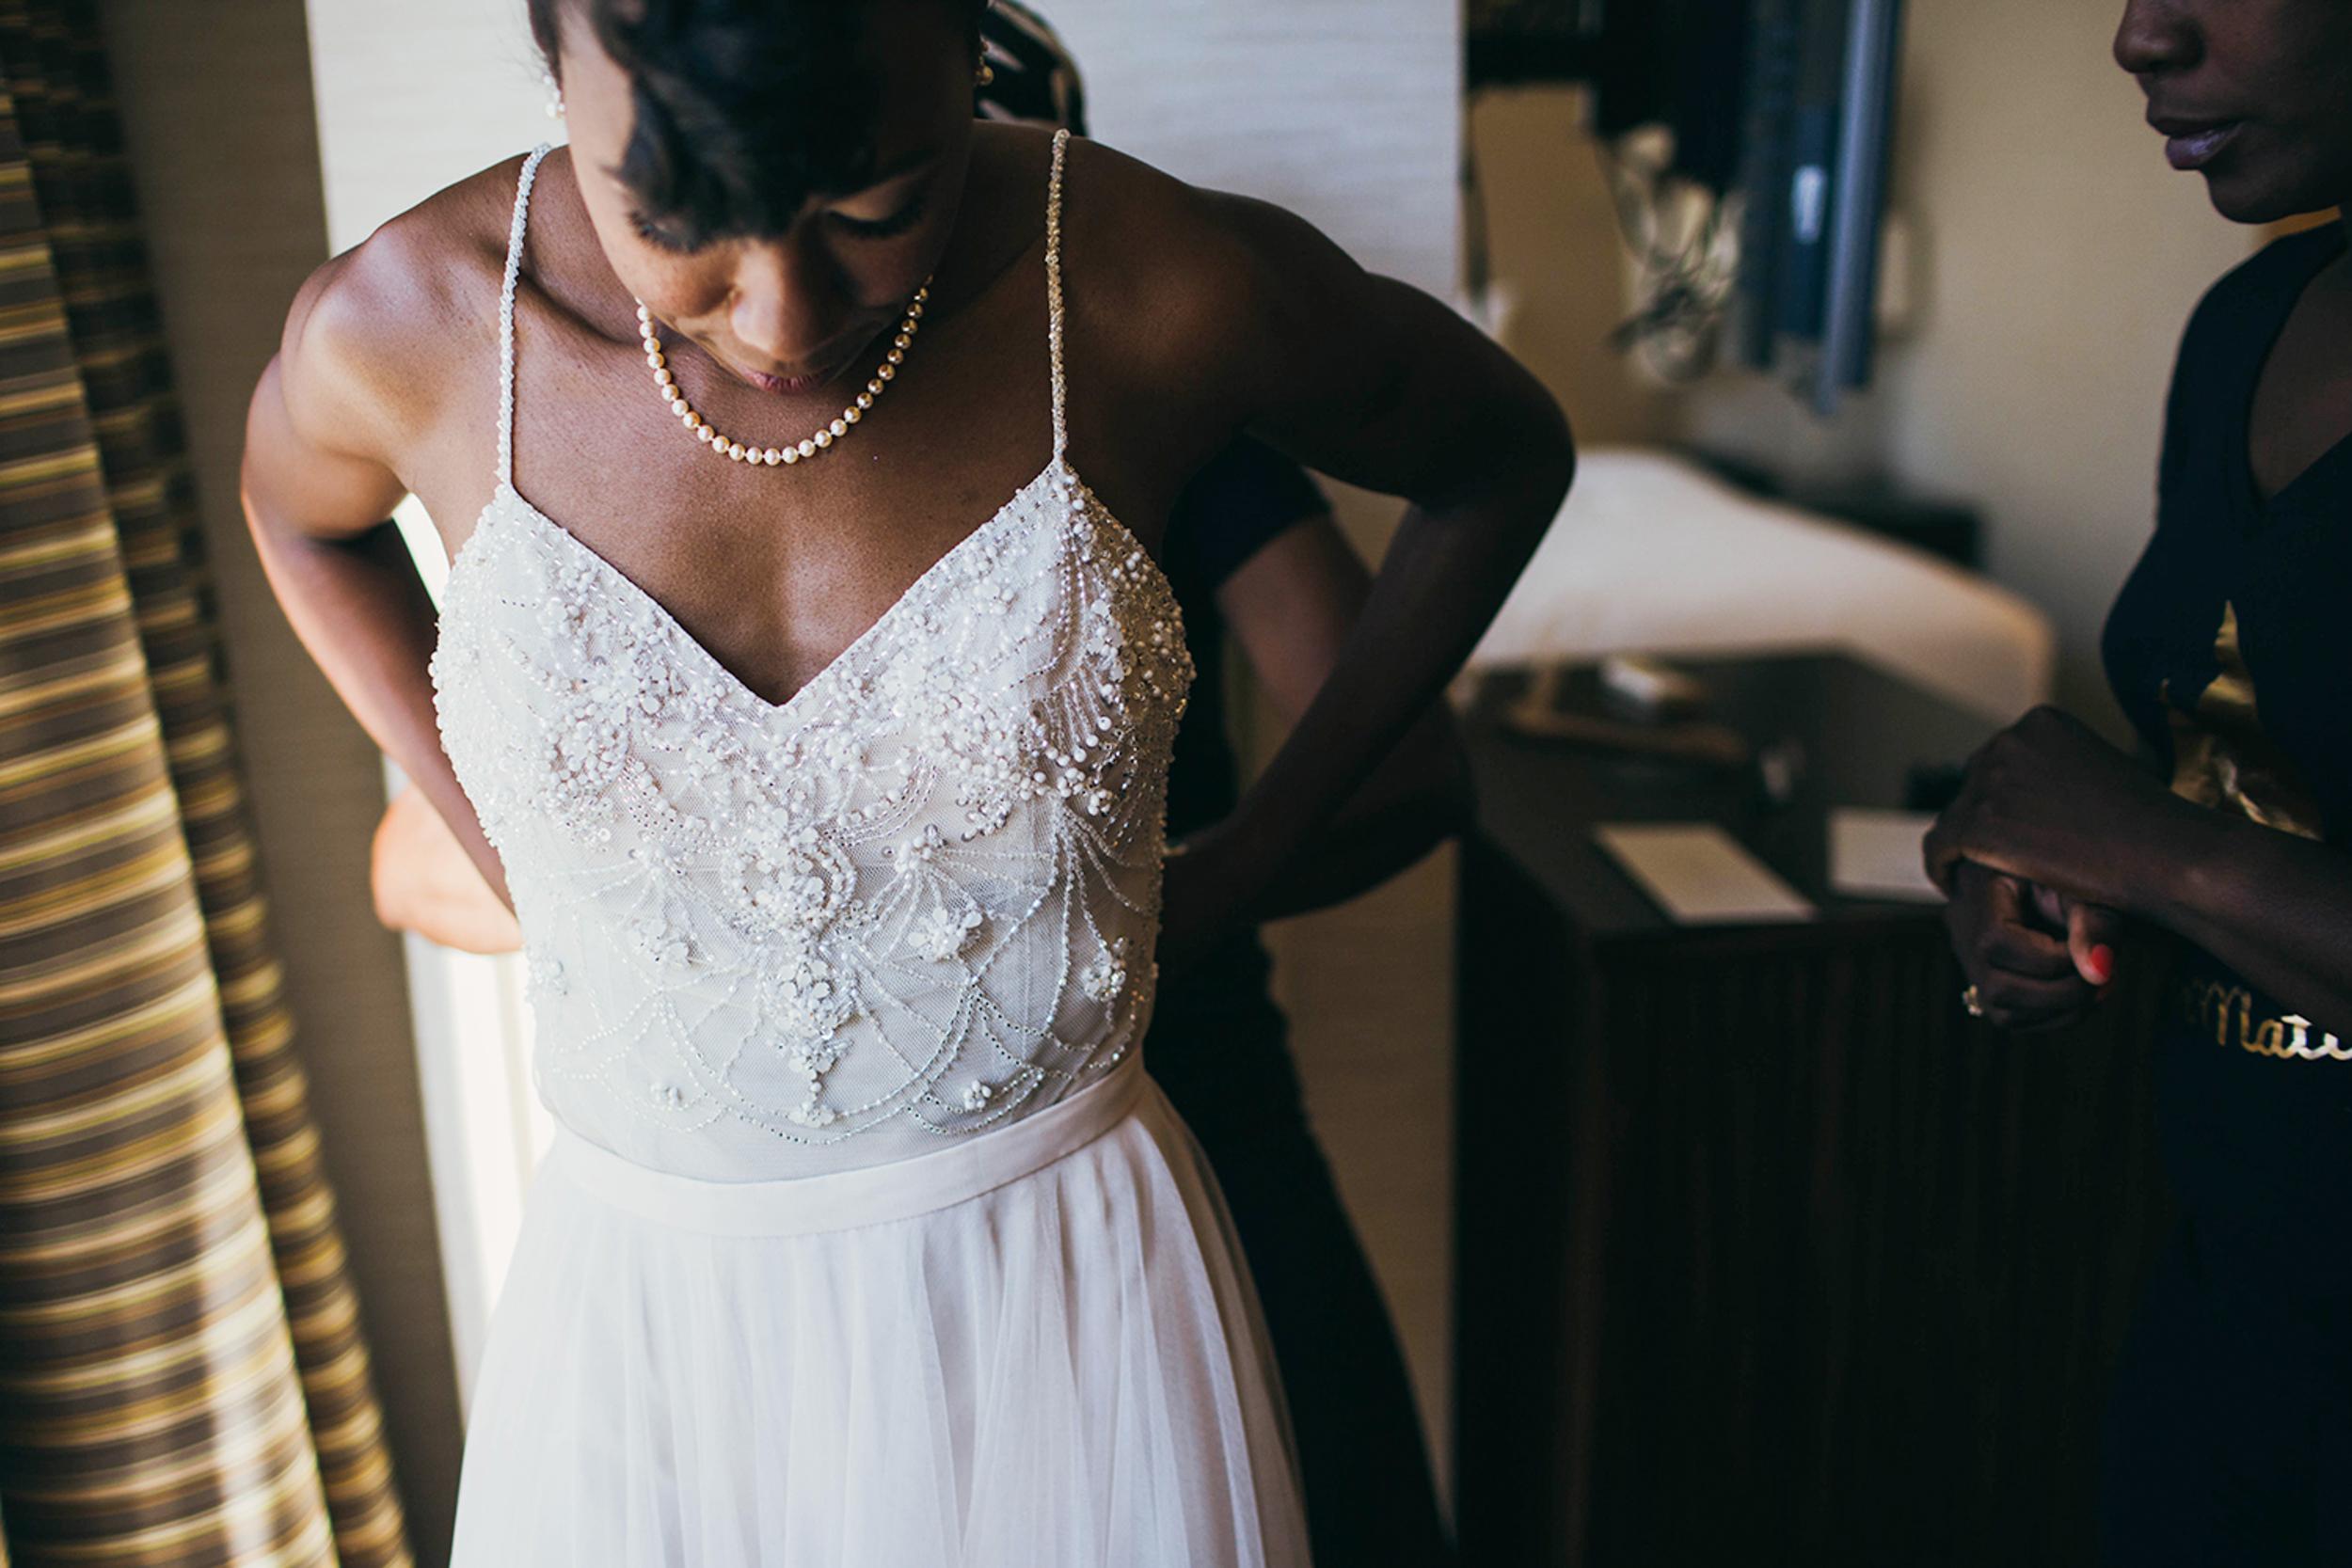 chicago.wedding.urban.intimate.zed451.lake.milton olive park-10.jpg